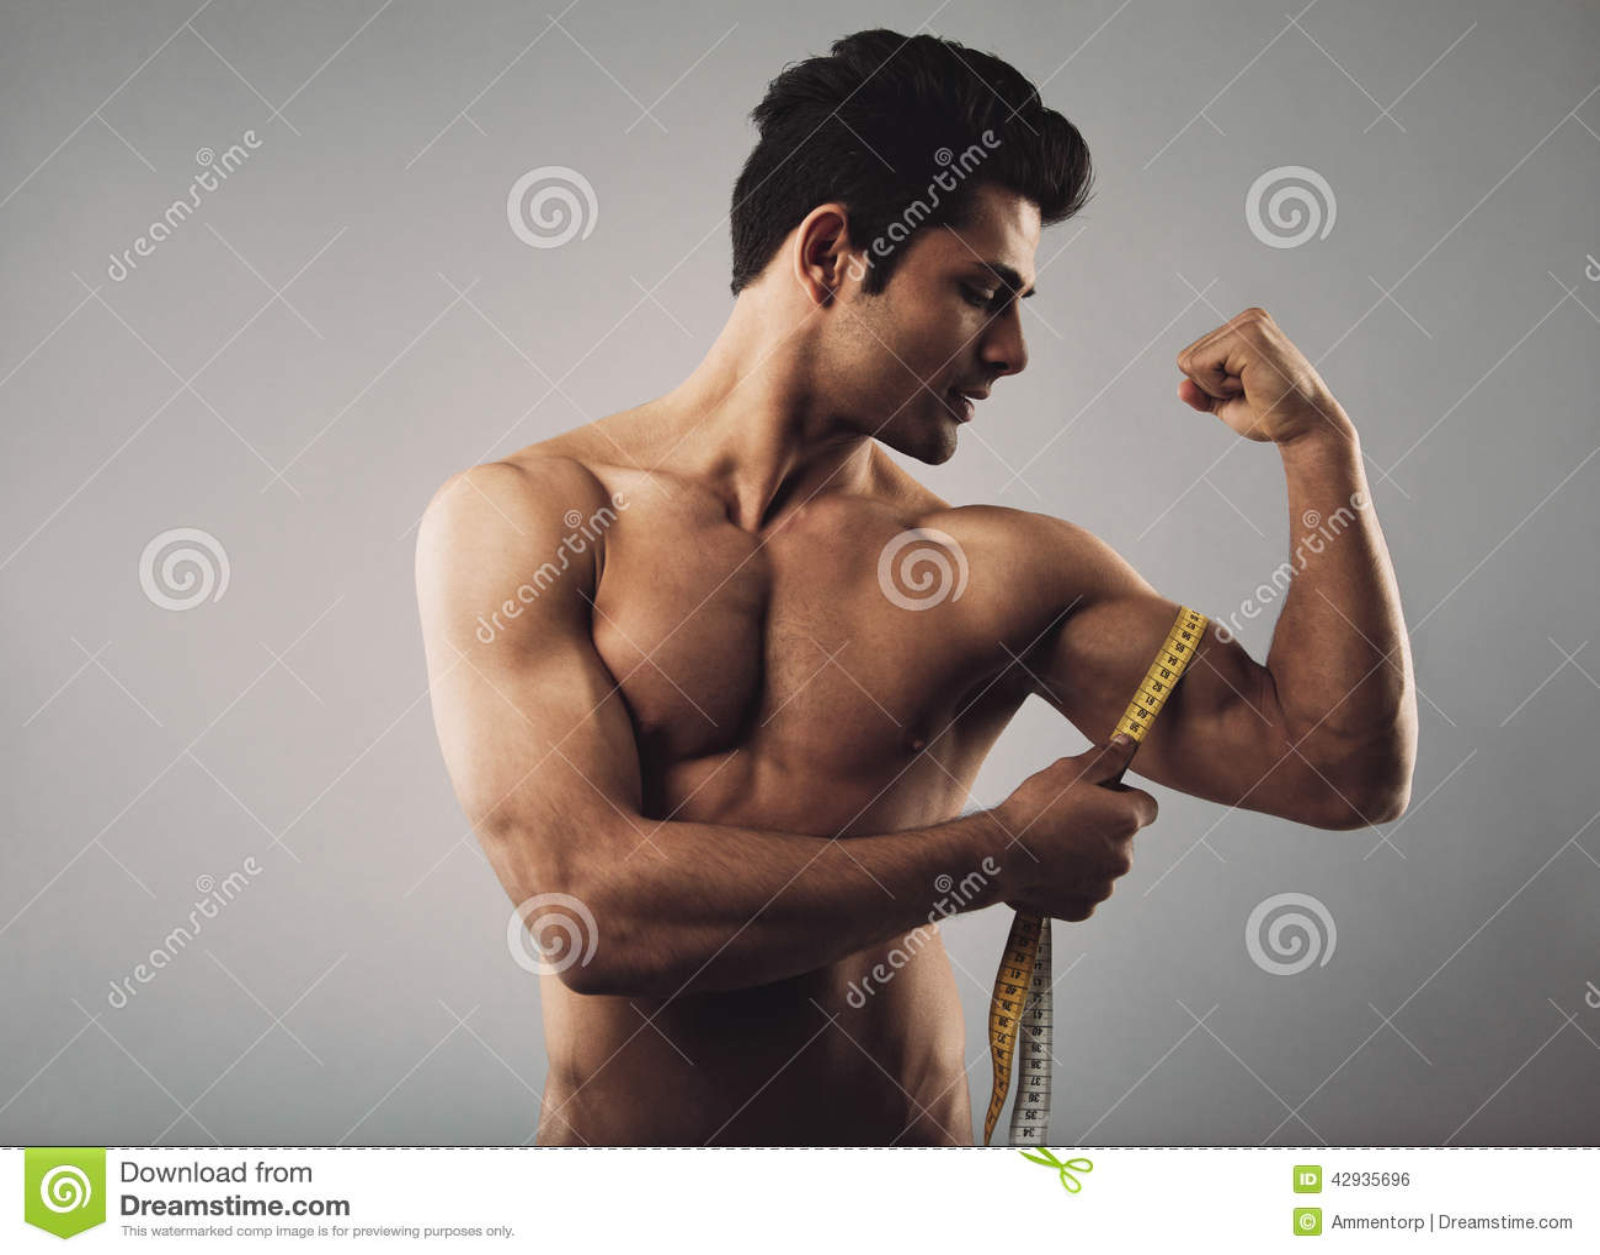 Muscular male measuring biceps